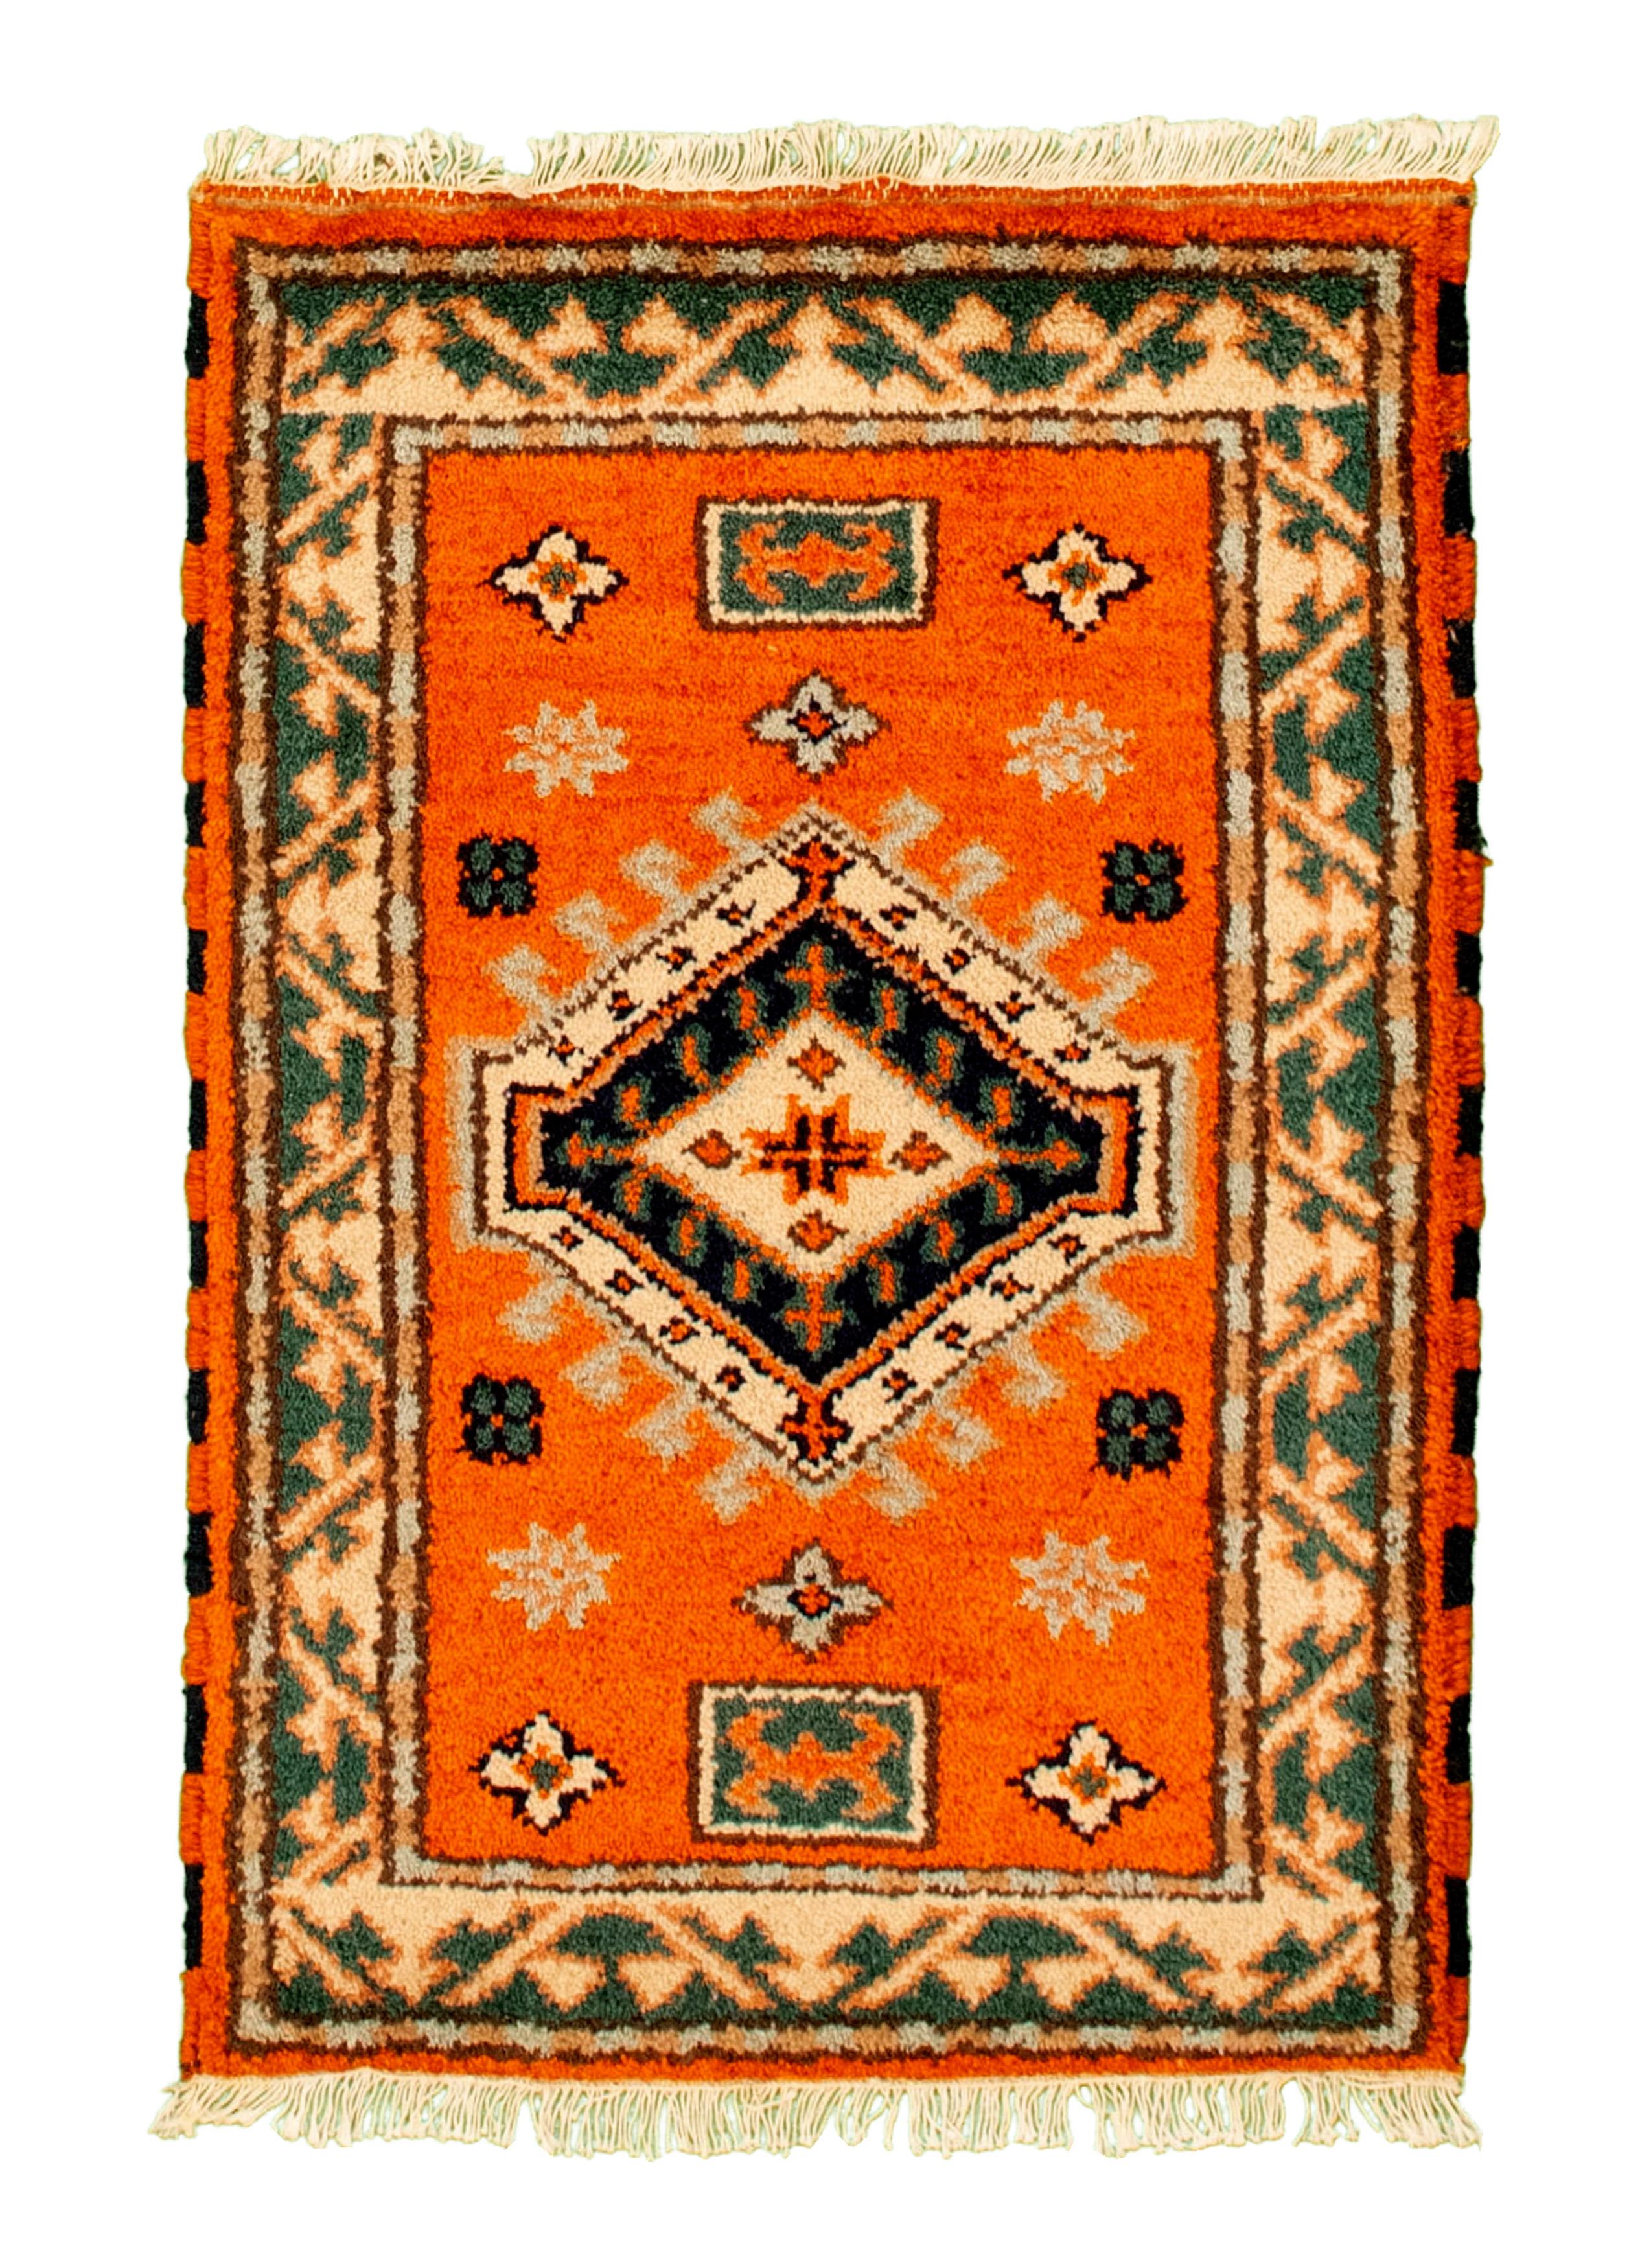 "Hand-knotted Royal Kazak Orange Cotton Rug 2'1"" x 3'0""  Size: 2'1"" x 3'0"""